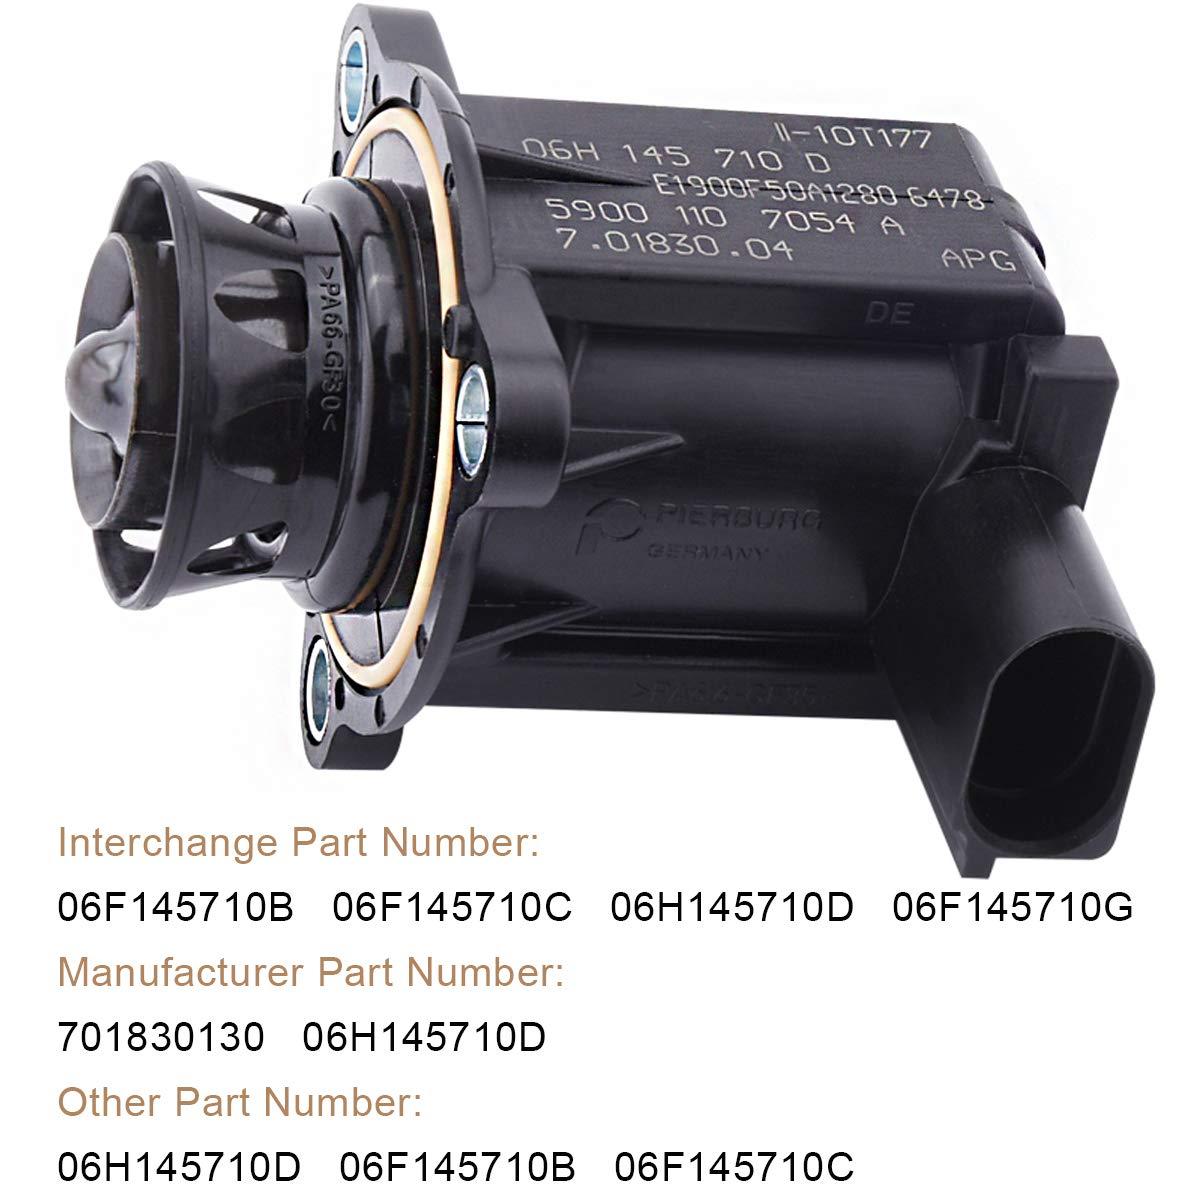 Turbo Diverter Solenoid Valve 06F145710B 06F145710C 06F145710G 06H145710D